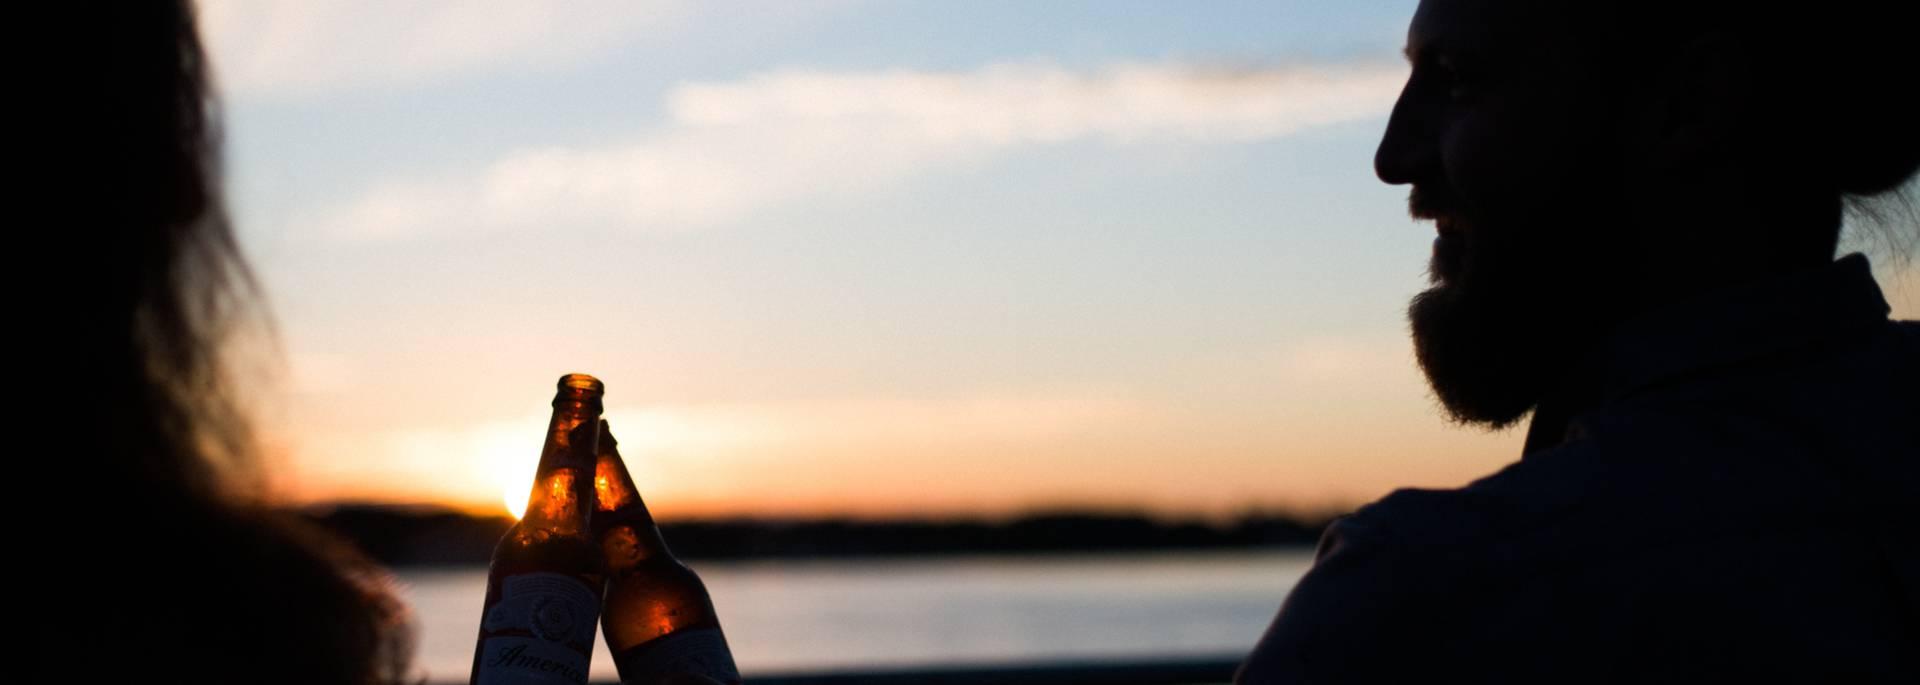 Boire un verre entre amis en Pays Bigouden